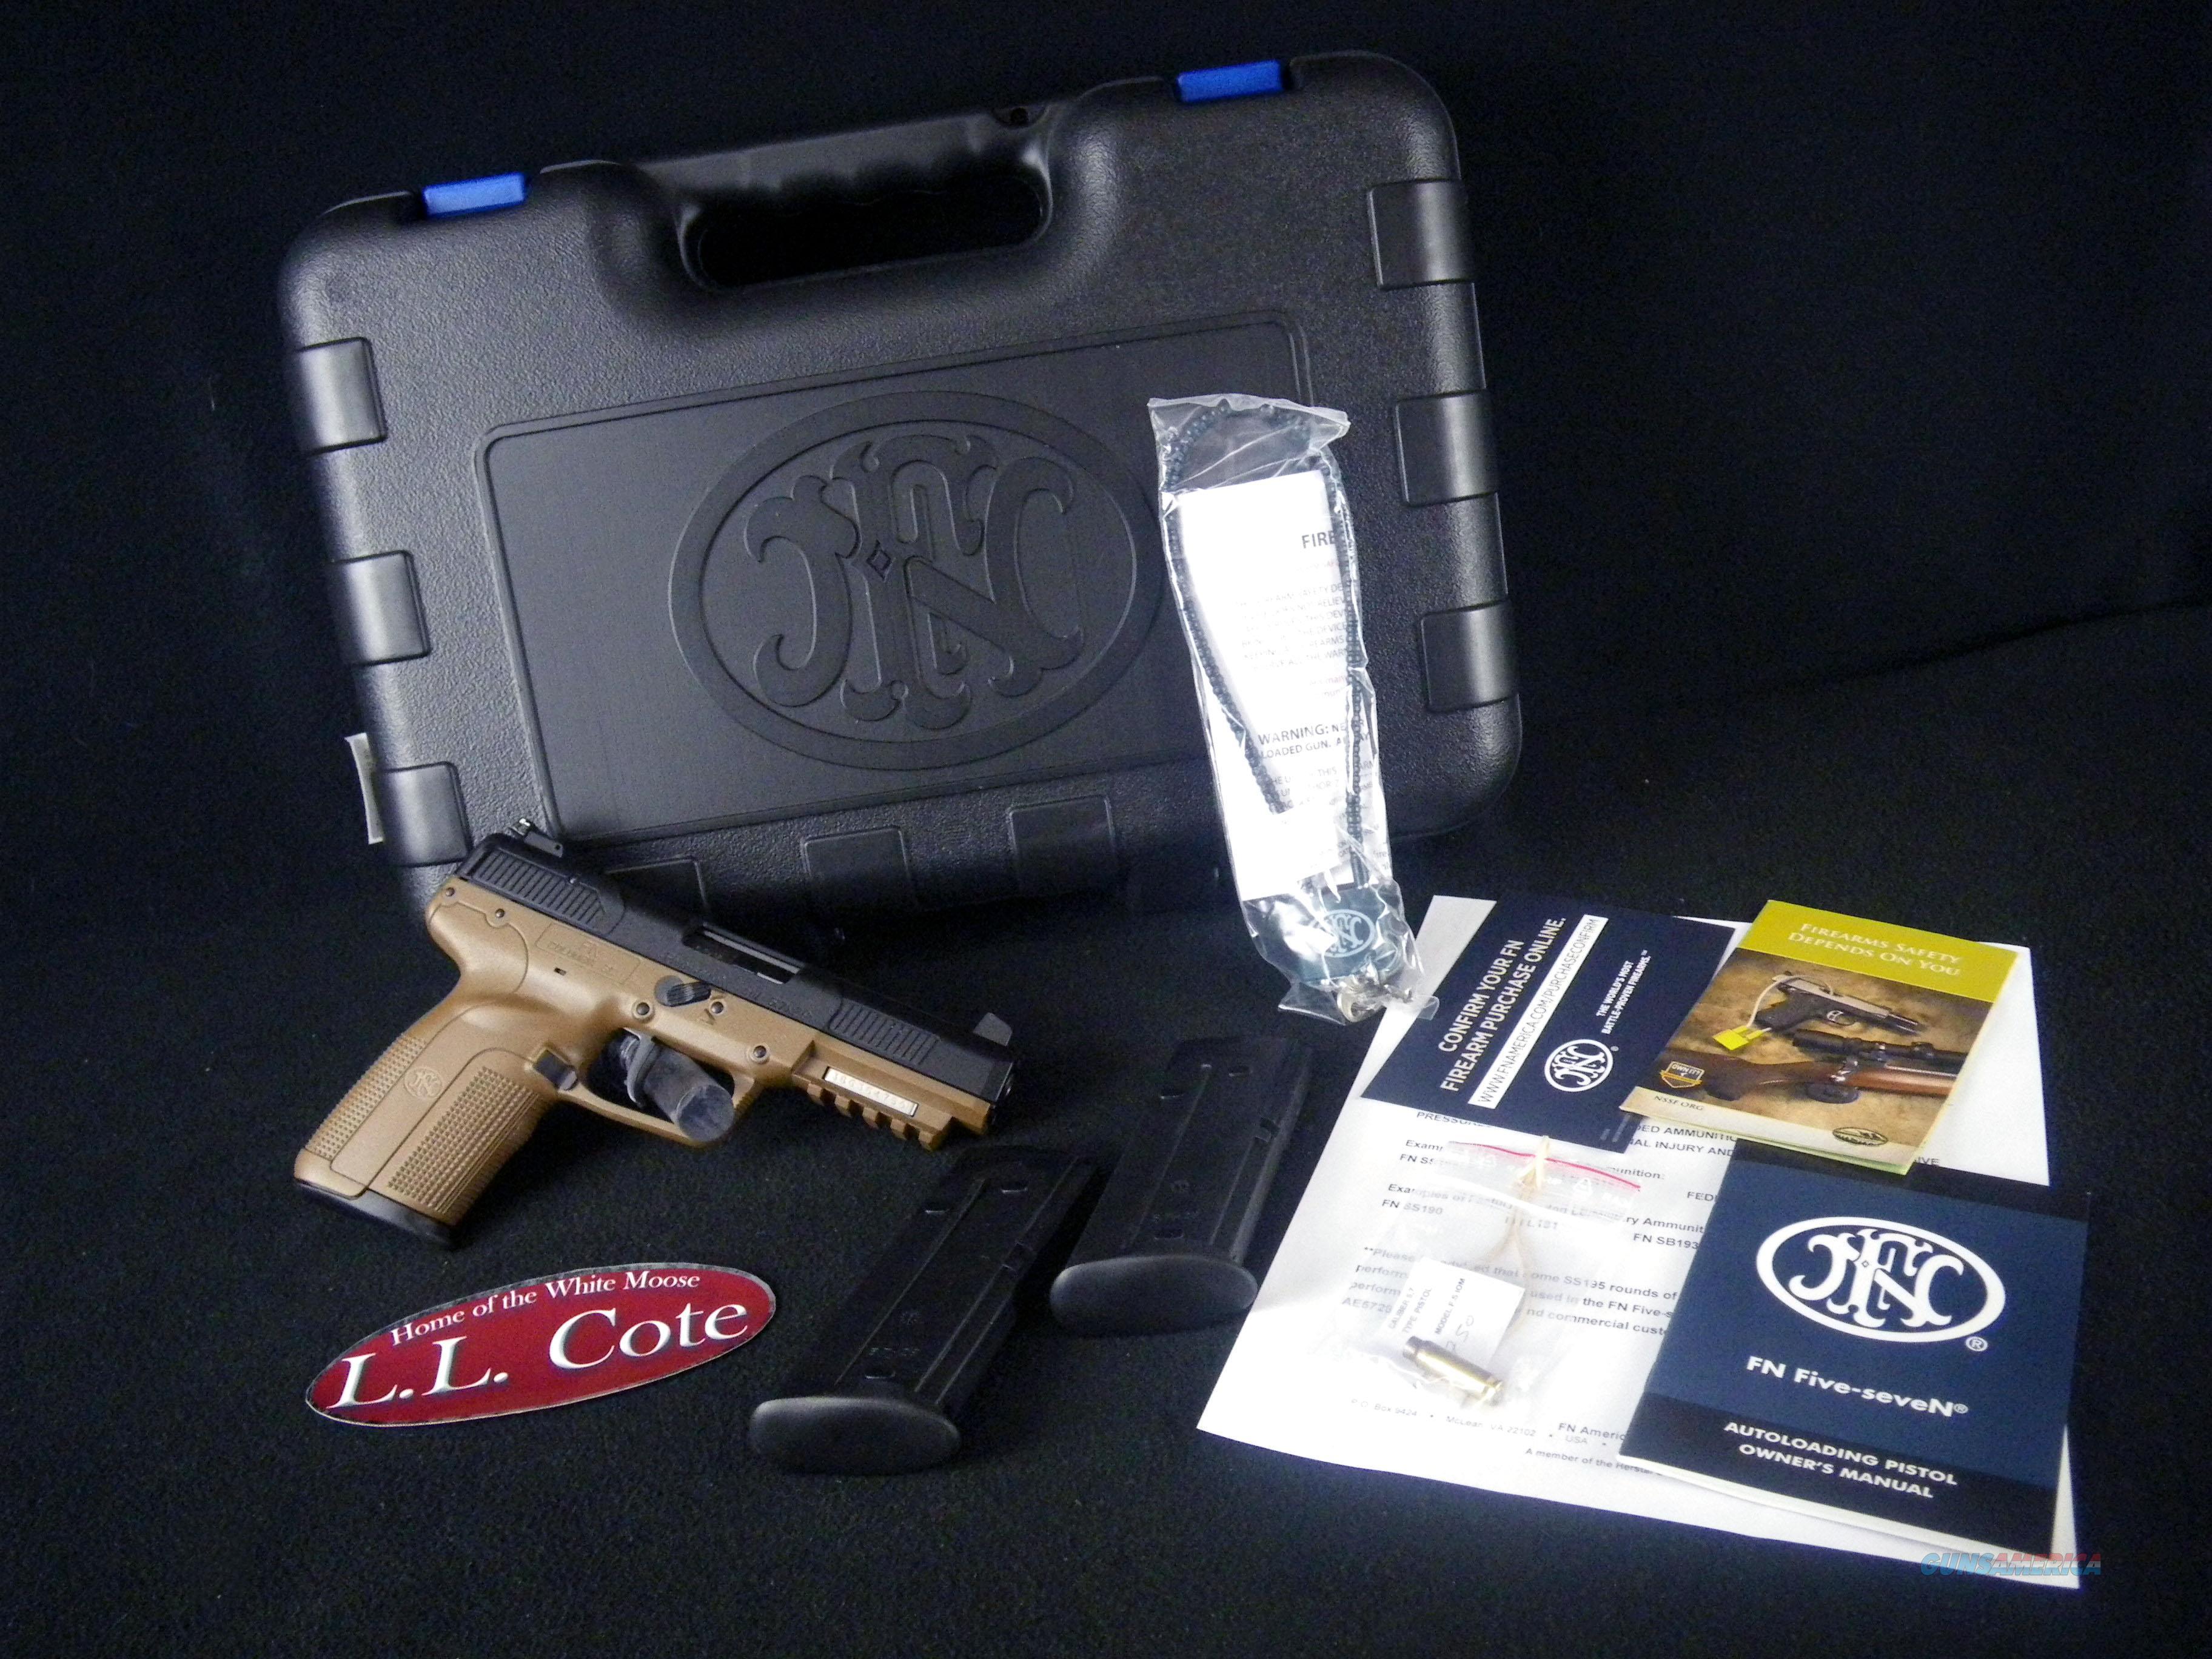 "FNH Five-Seven FDE 5.7x28 4.8"" NEW 3868929350  Guns > Pistols > FNH - Fabrique Nationale (FN) Pistols > FiveSeven"